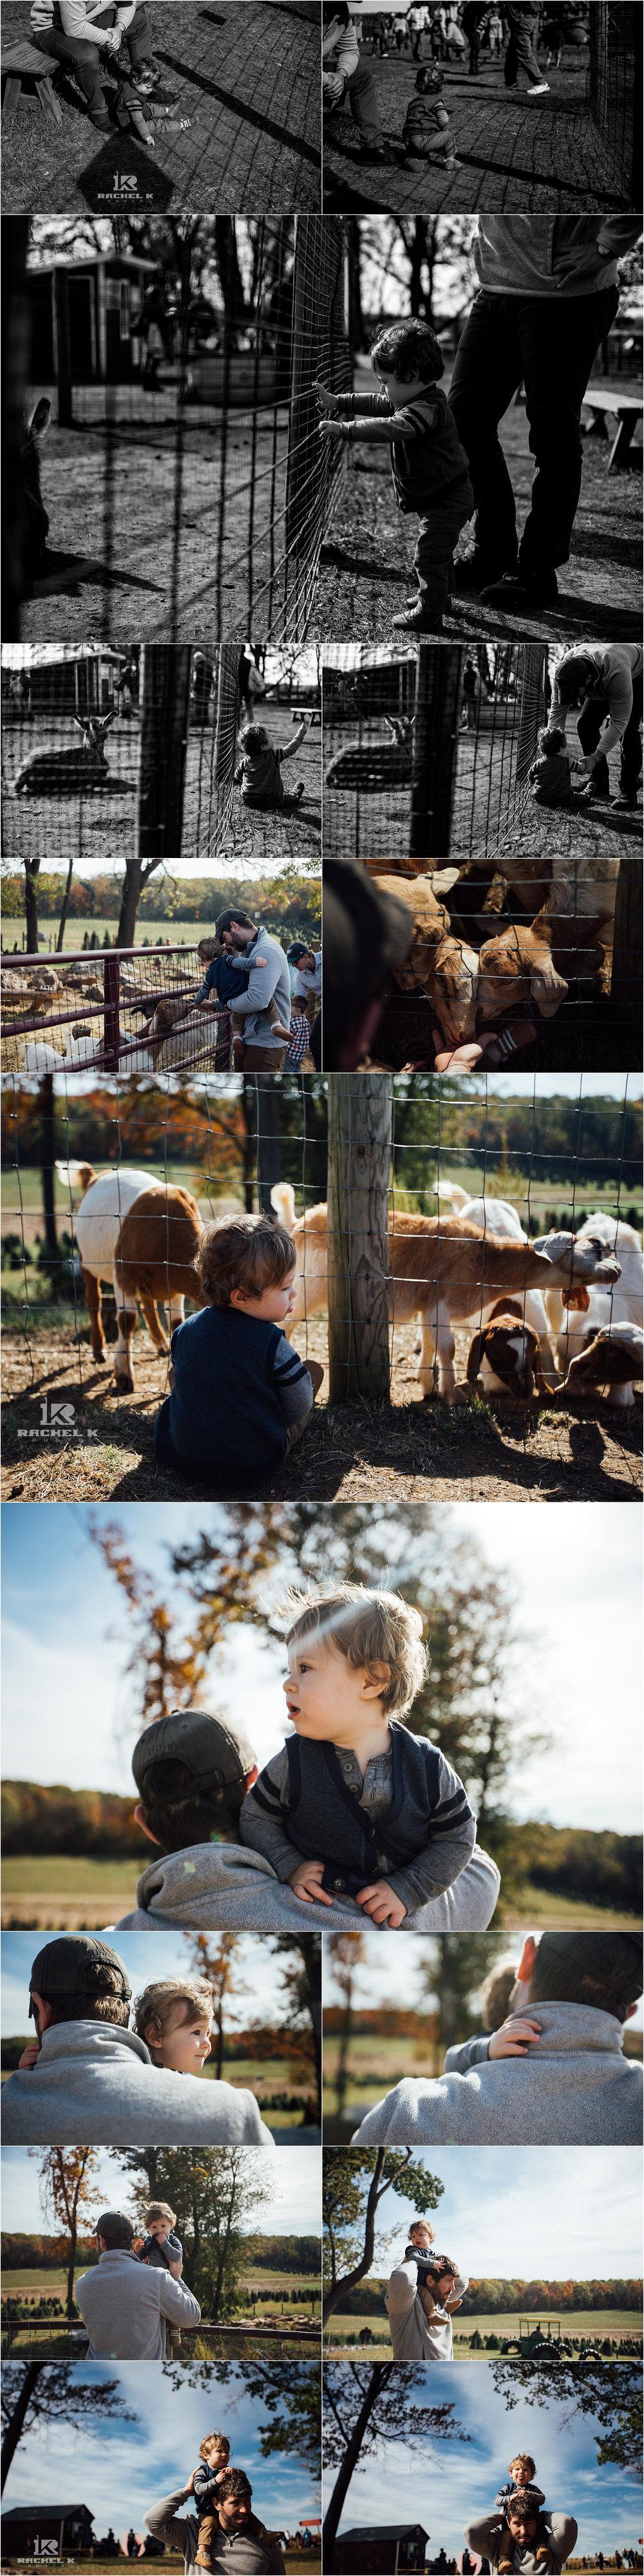 Fairfax Virginia photographer Rachel K Photo's October personal photos